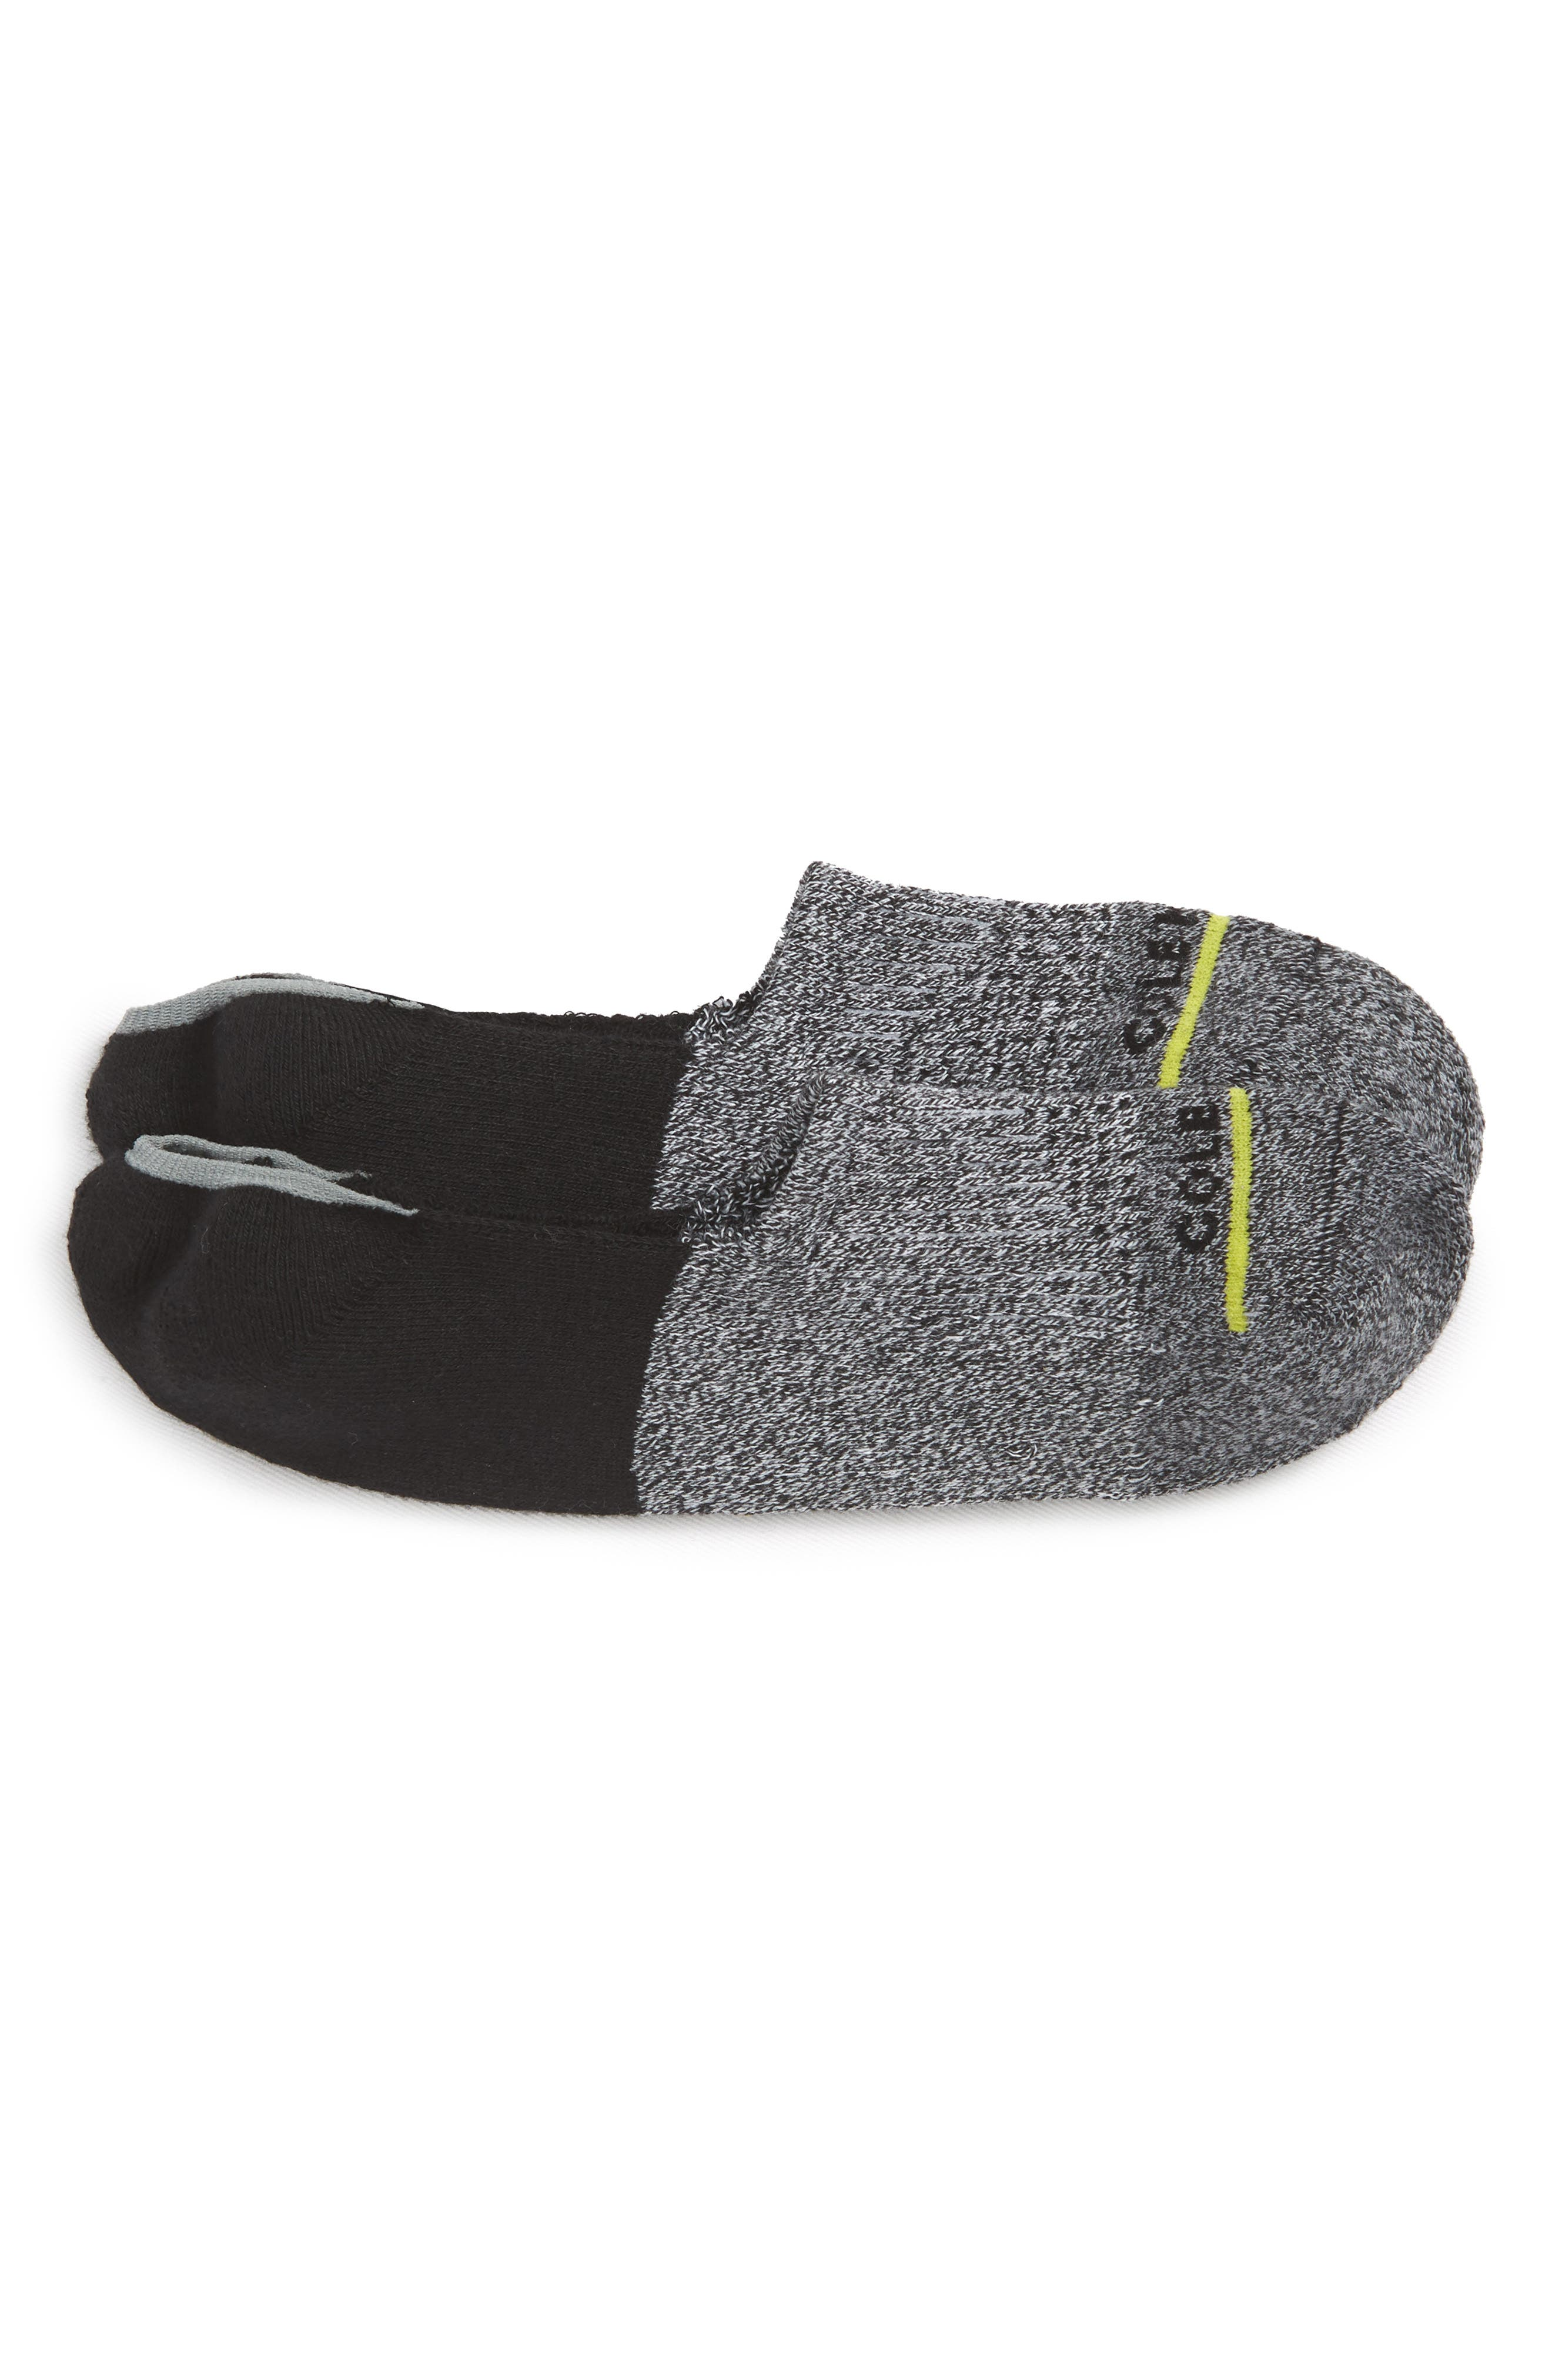 ZeroGrand Liner Socks,                             Main thumbnail 1, color,                             001